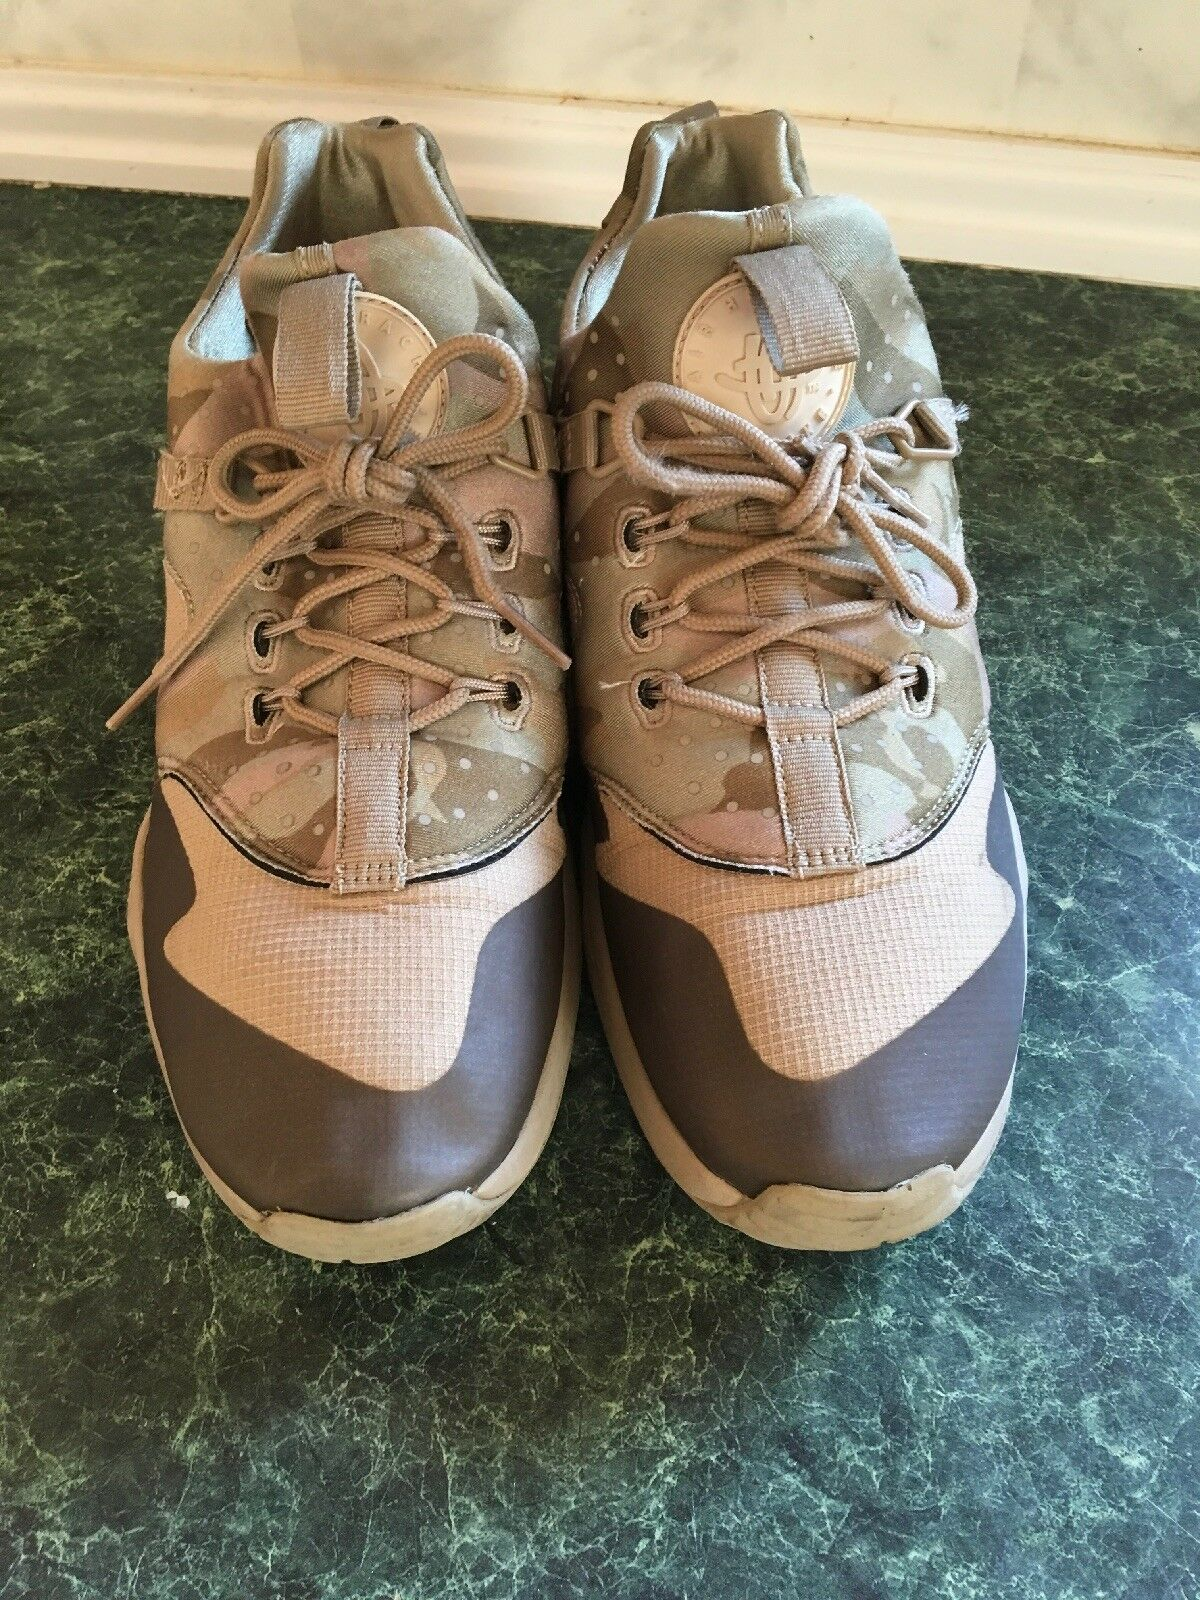 nike air huarache utility Trainer  Desert Camo Khaki Olive men's size 9.5 Cheap and beautiful fashion